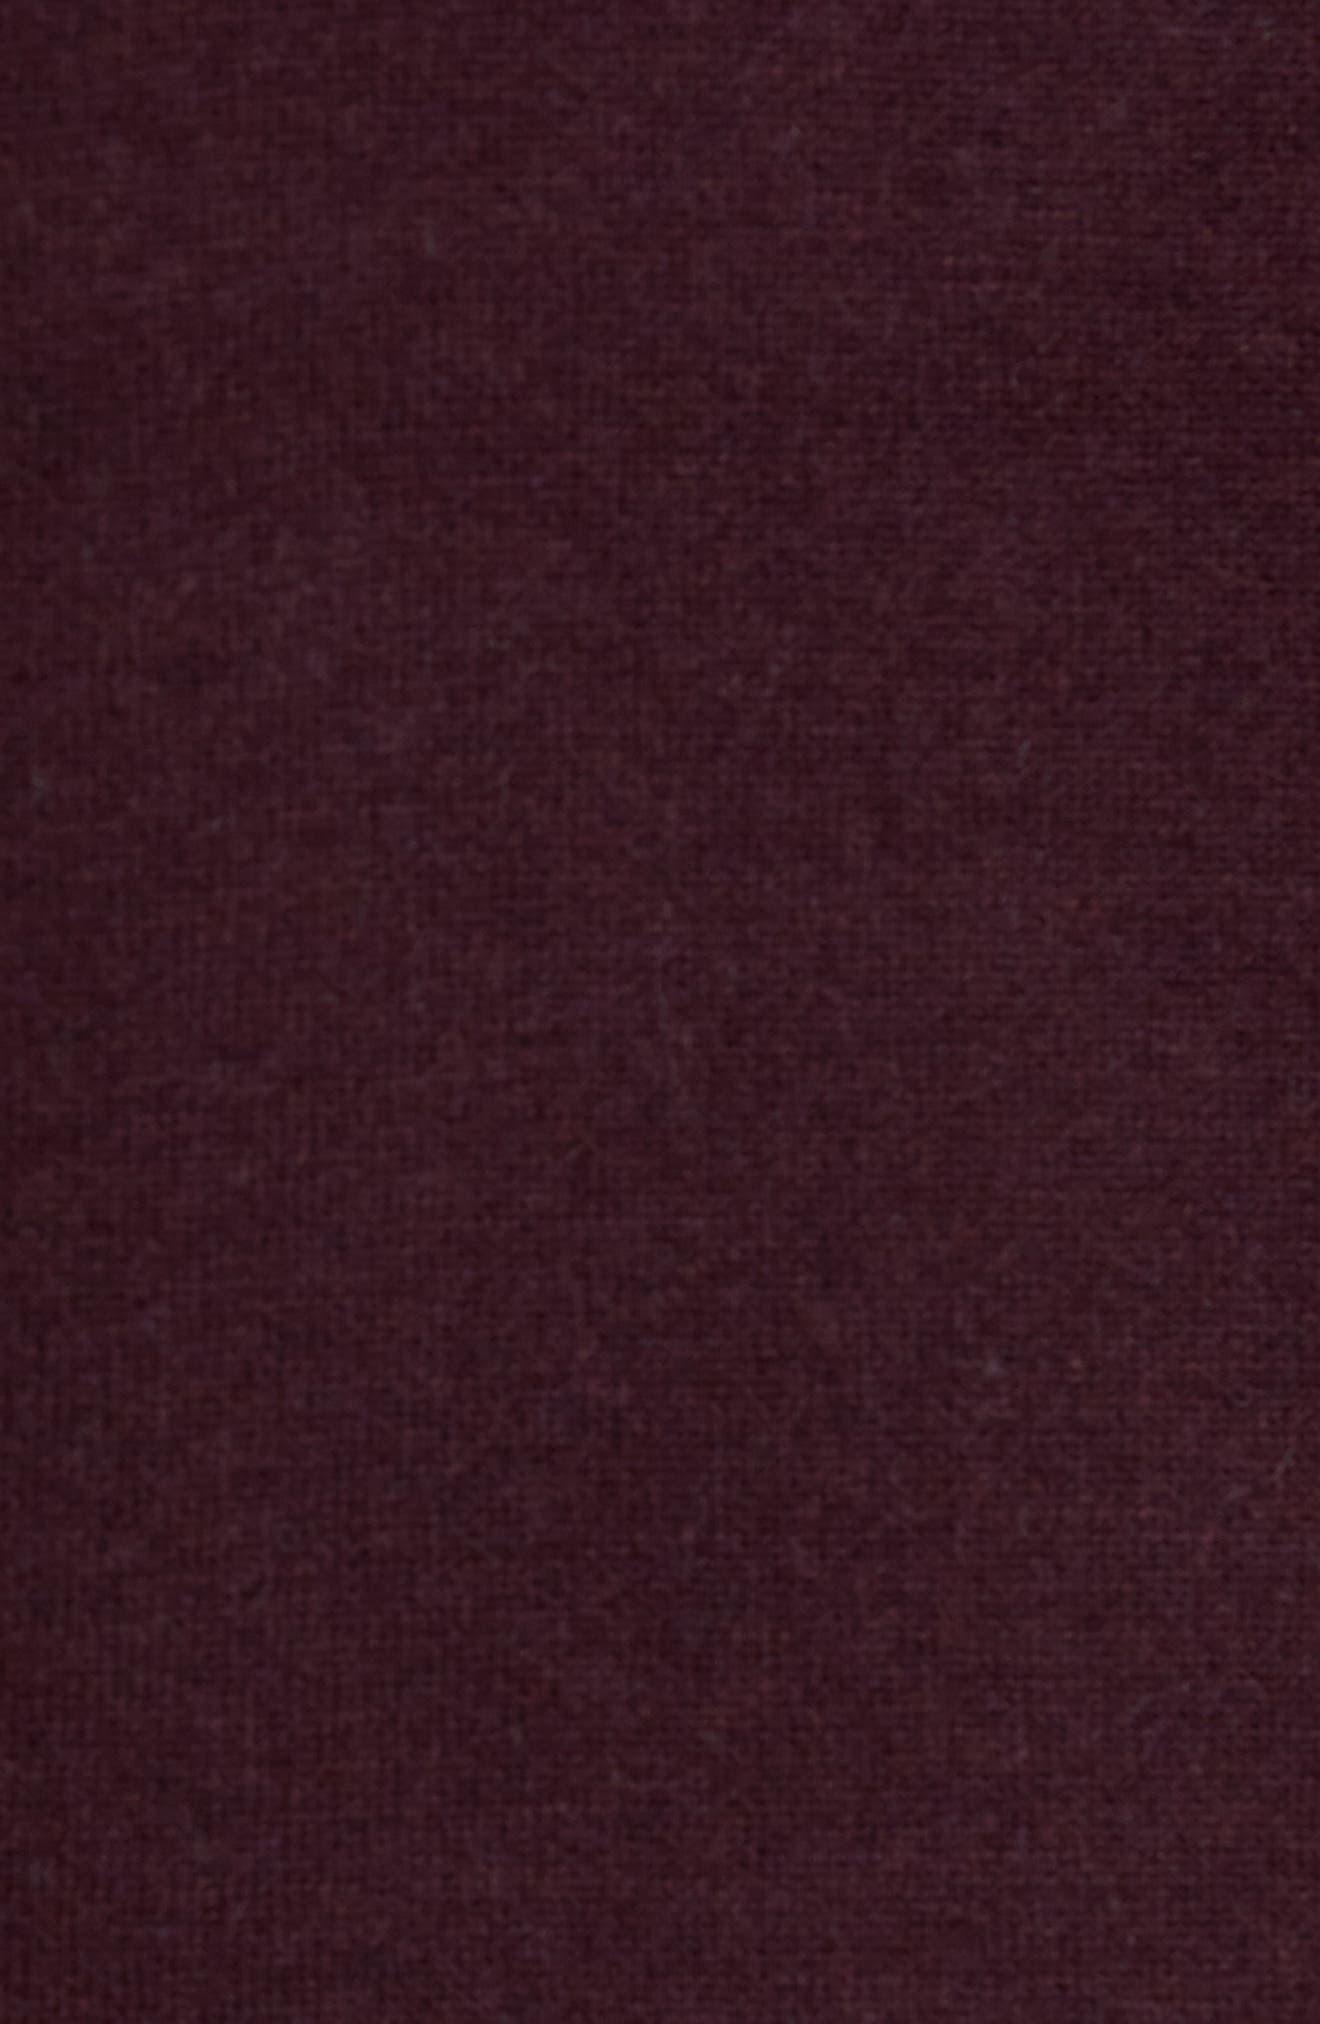 Merino Wool Baseball Sweater,                             Alternate thumbnail 10, color,